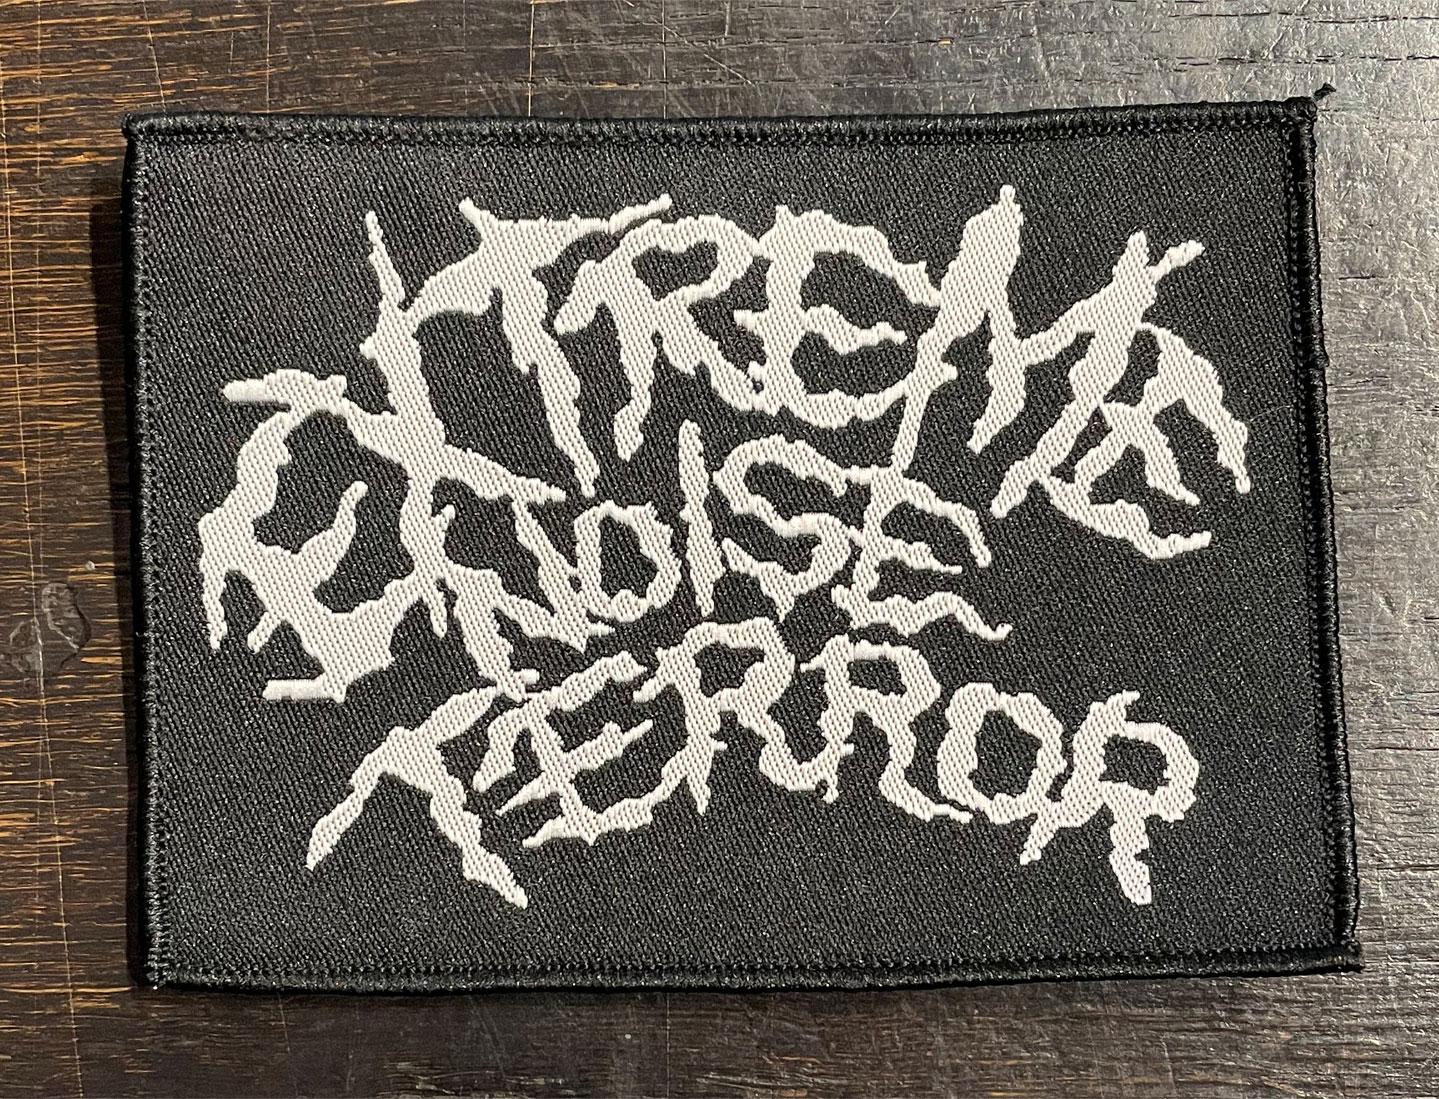 EXTREME NOISE TERROR 刺繍ワッペン LOGO オフィシャル